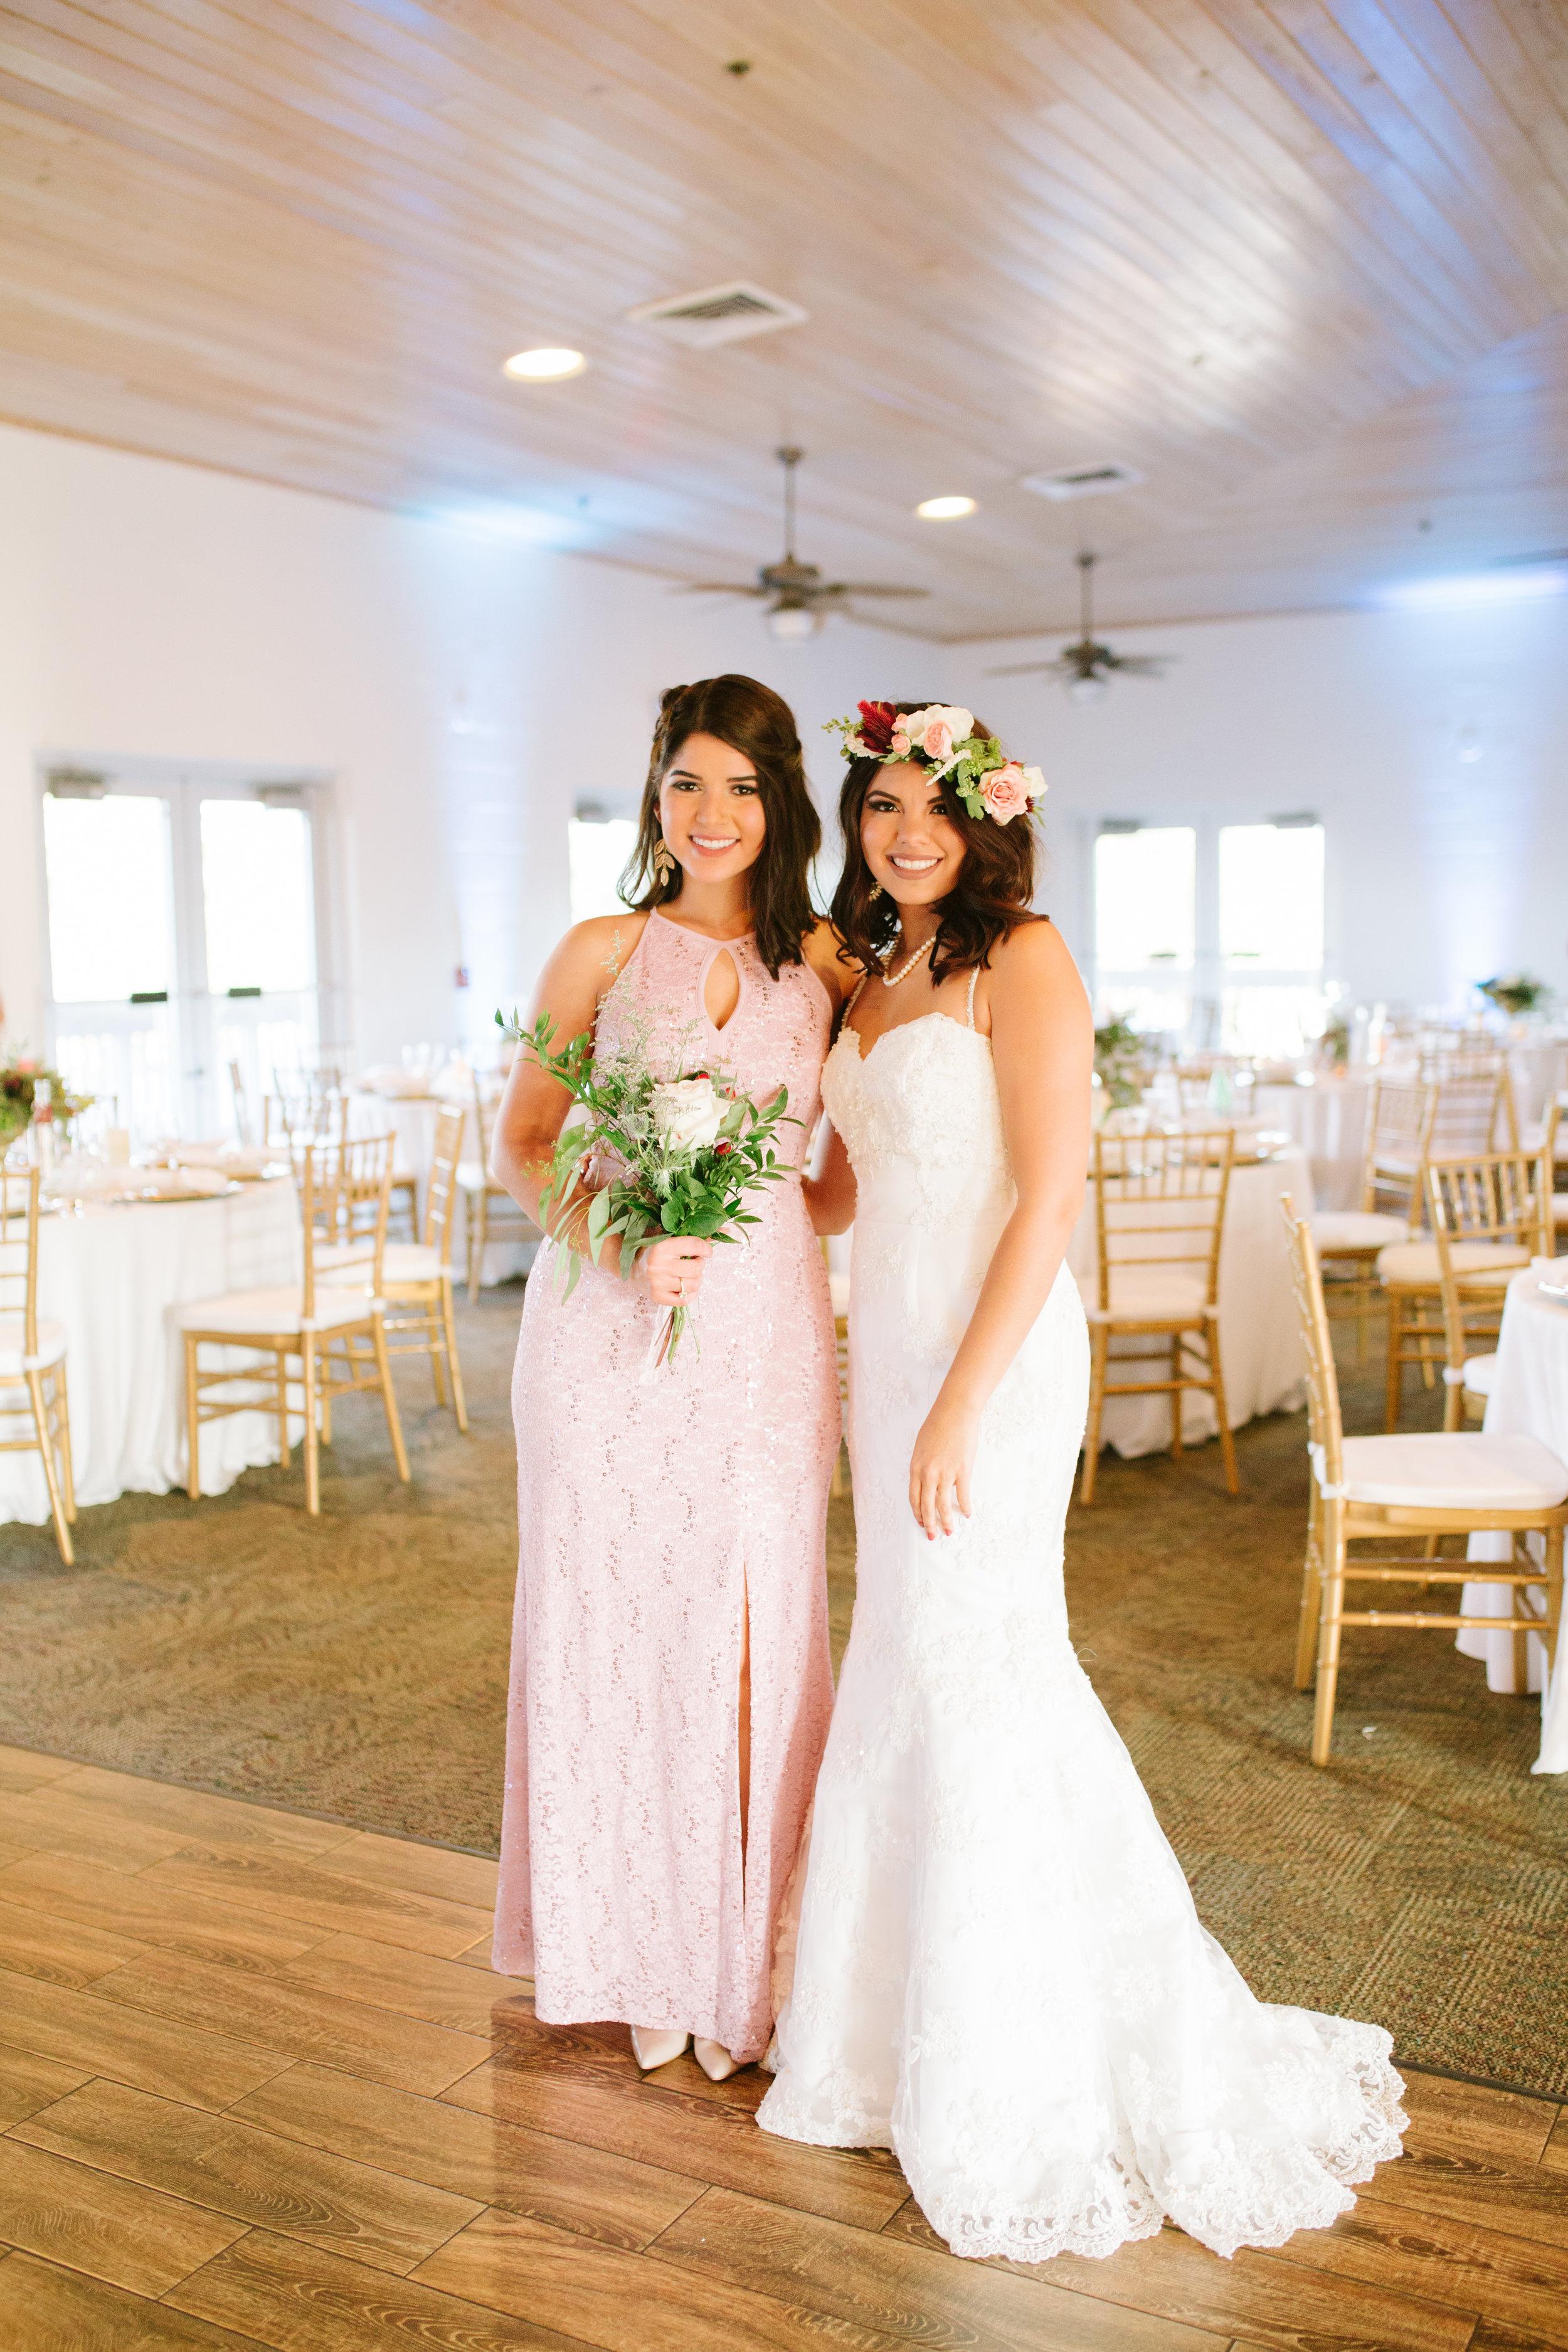 2017.05.23 Barbara and Mauricio Sales Port St Lucie Wedding (253 of 772).jpg